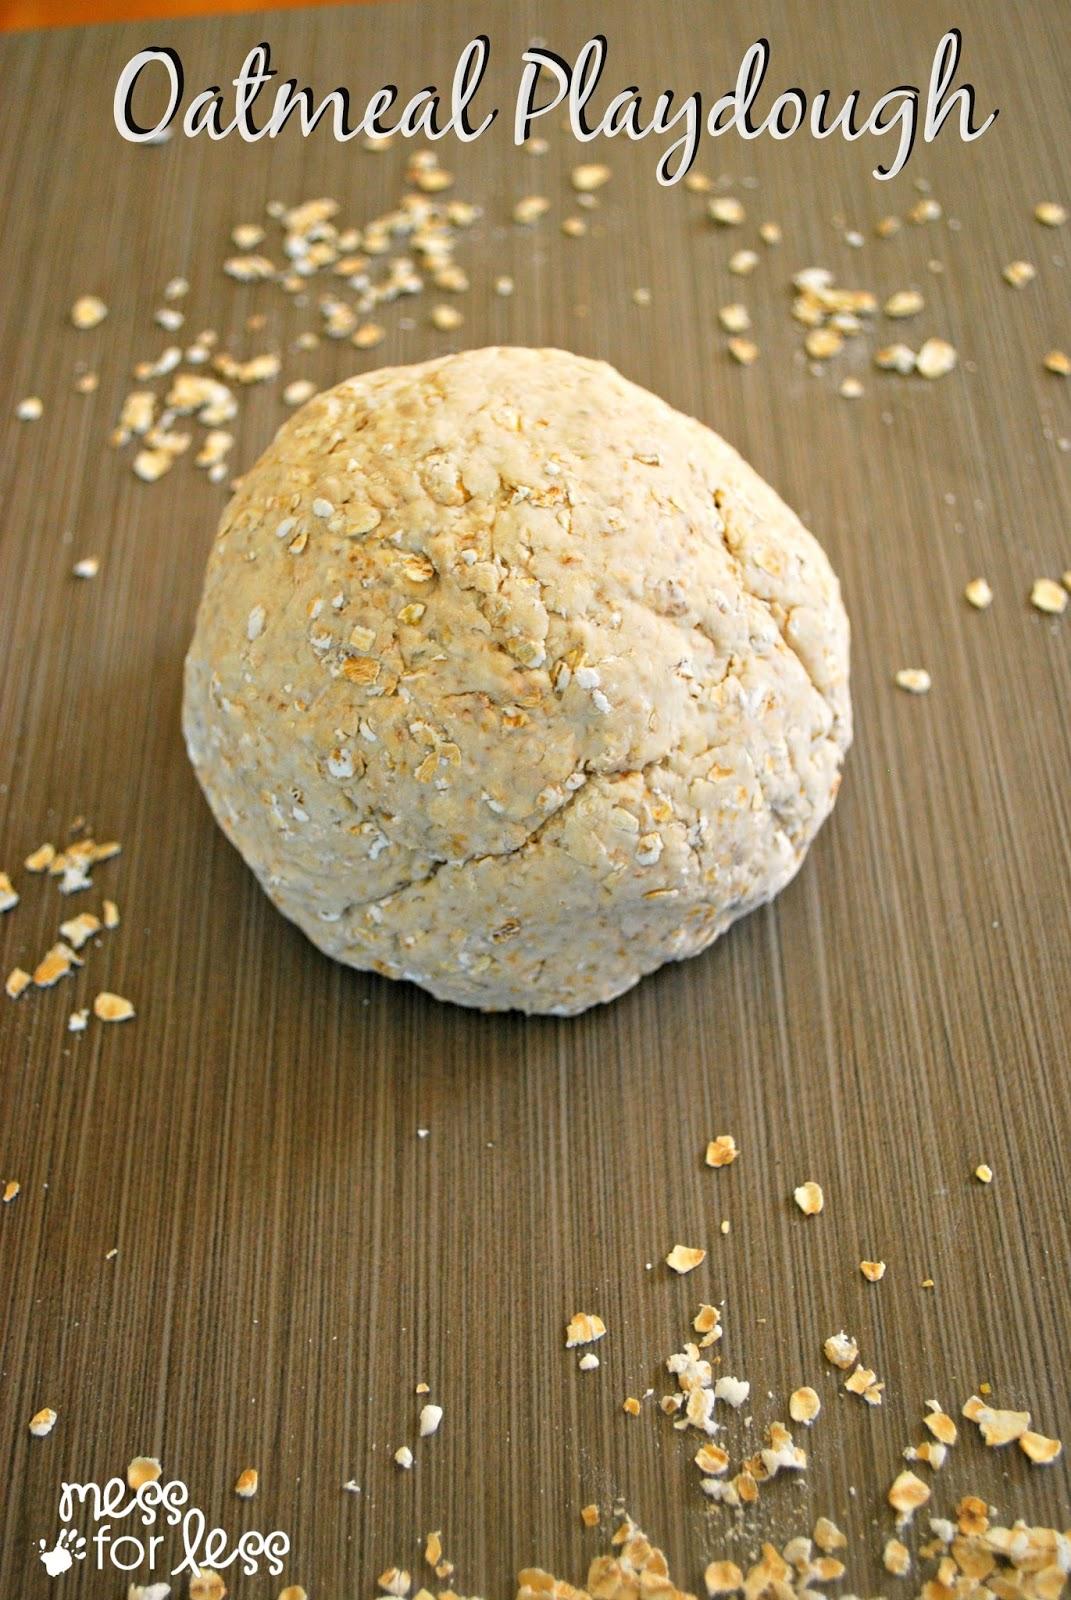 http://www.messforless.net/2014/04/oatmeal-playdough-recipe.html